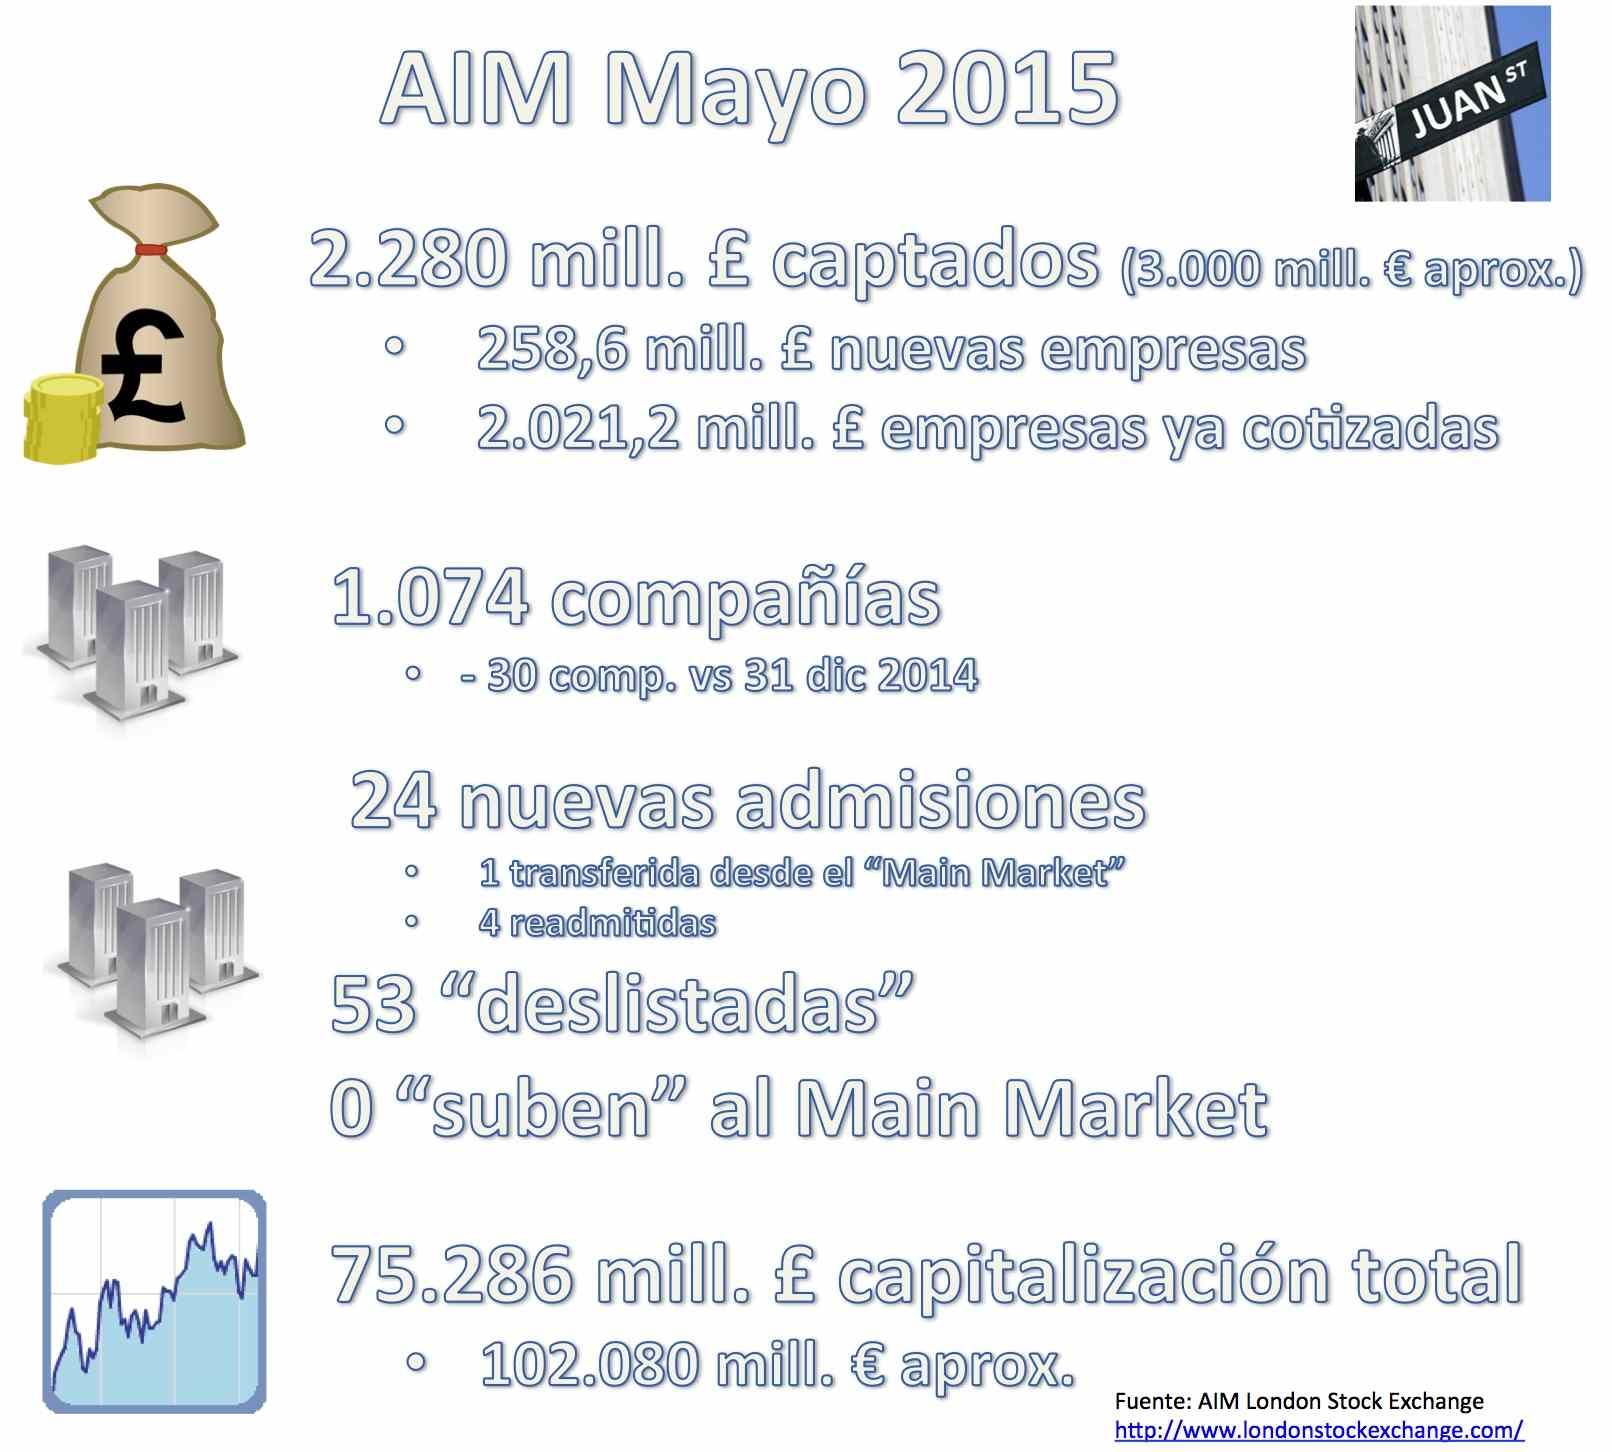 AIM 052015 cifras - estadisticas mayo 2015